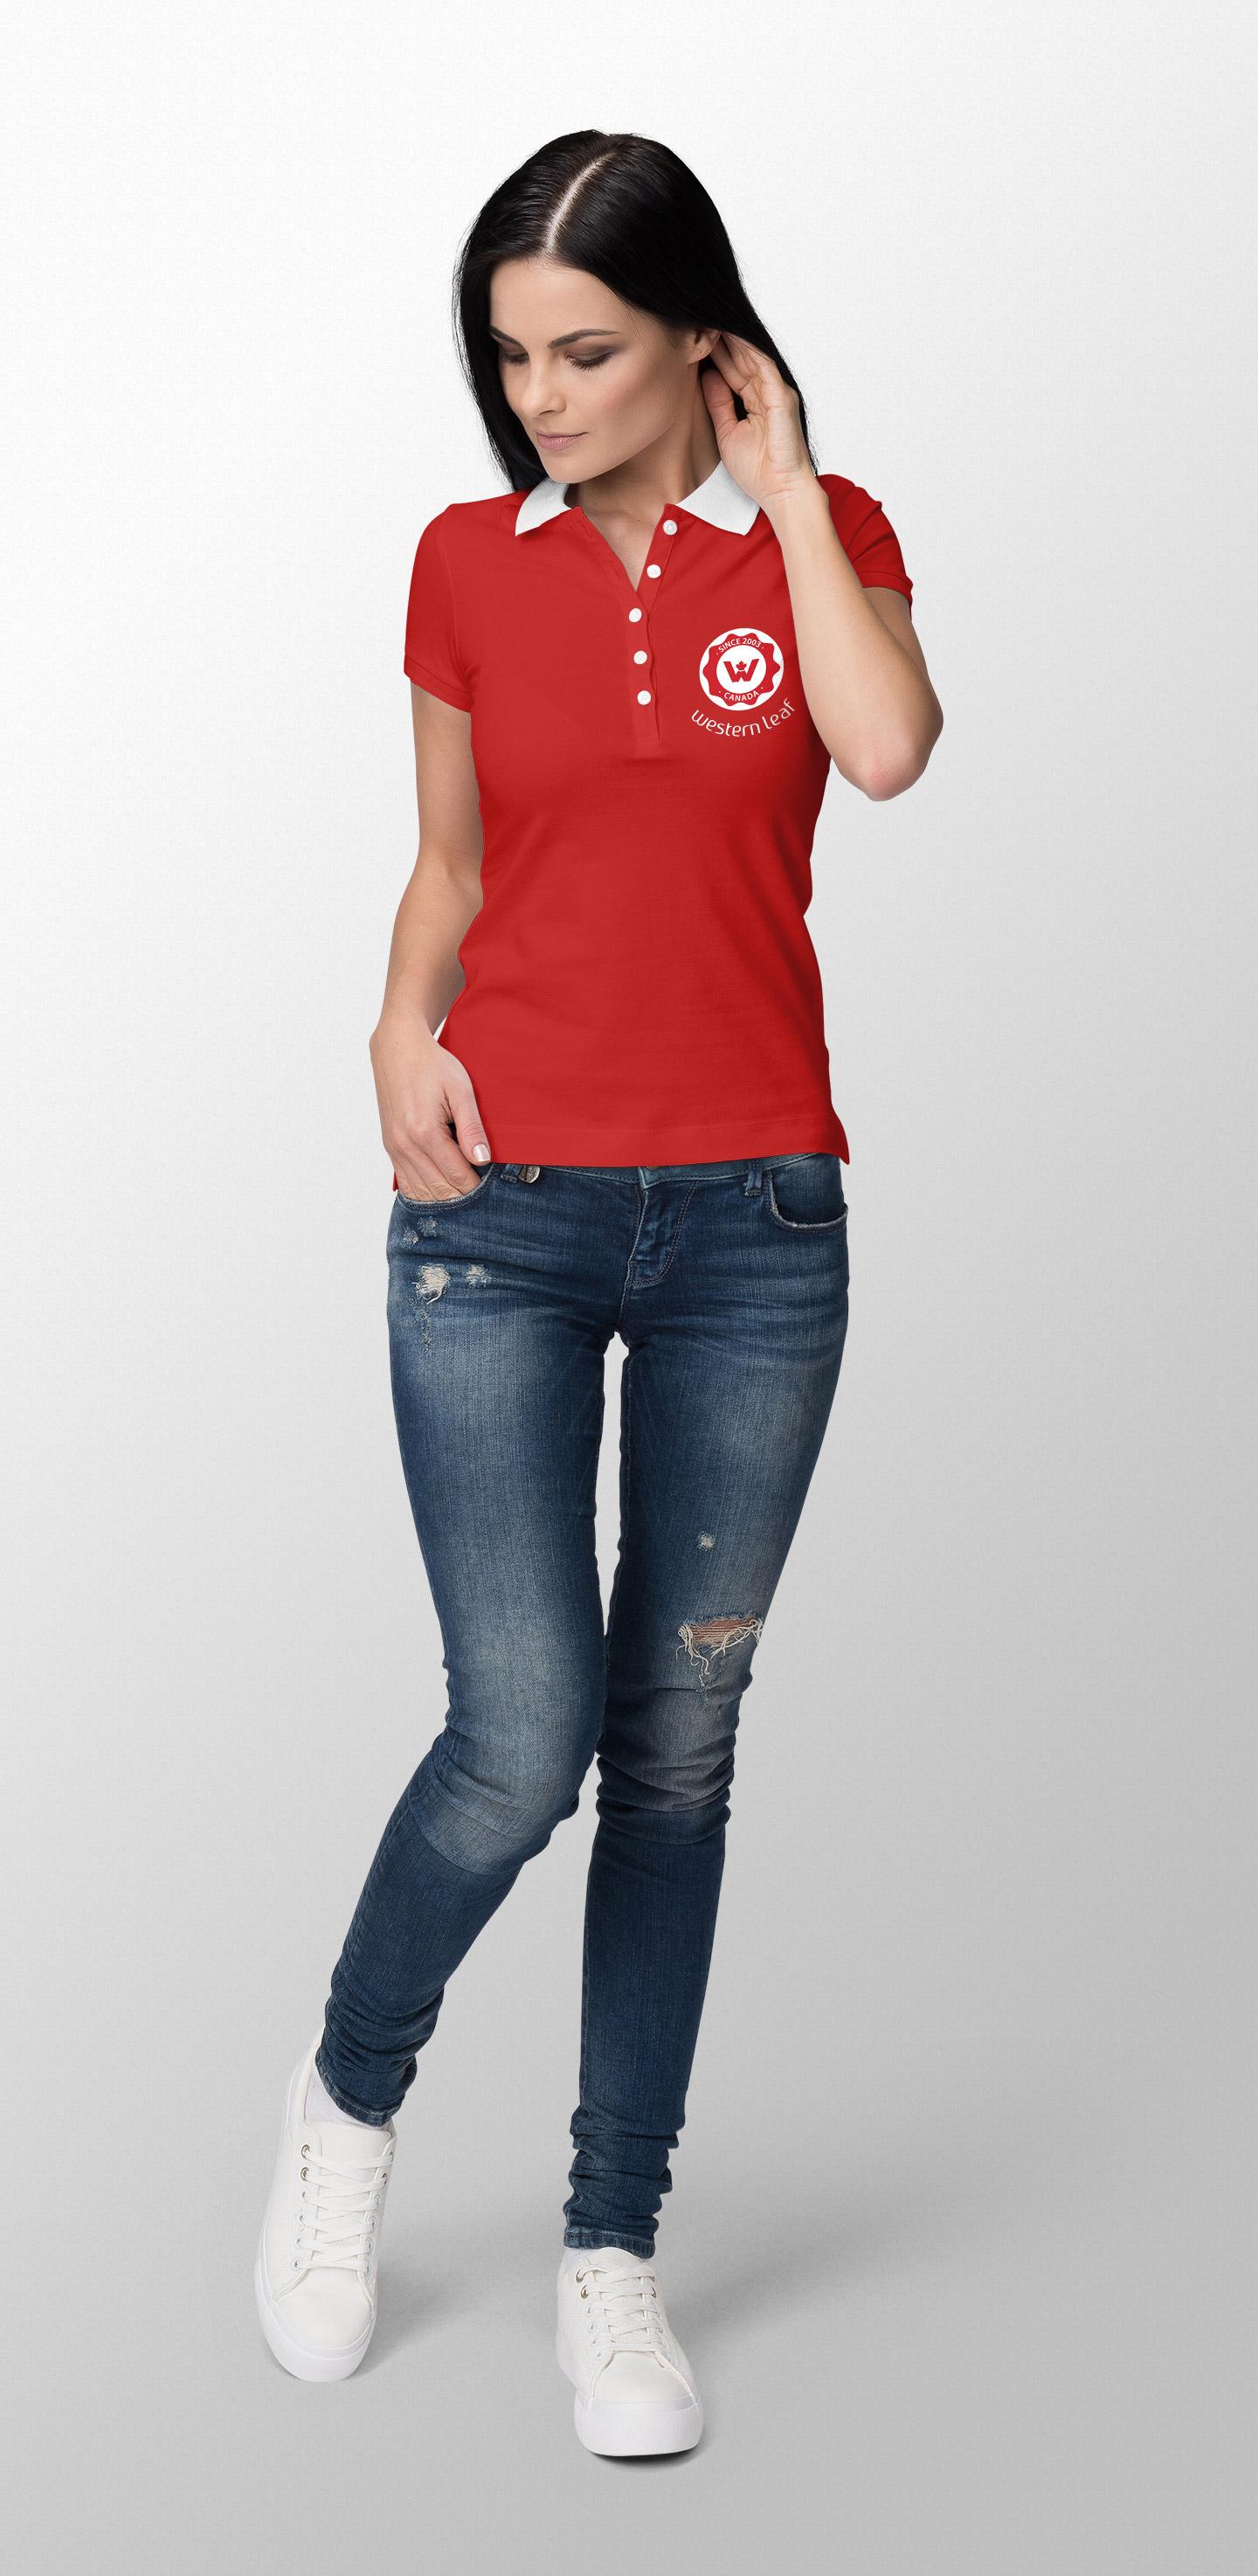 female work shirt design